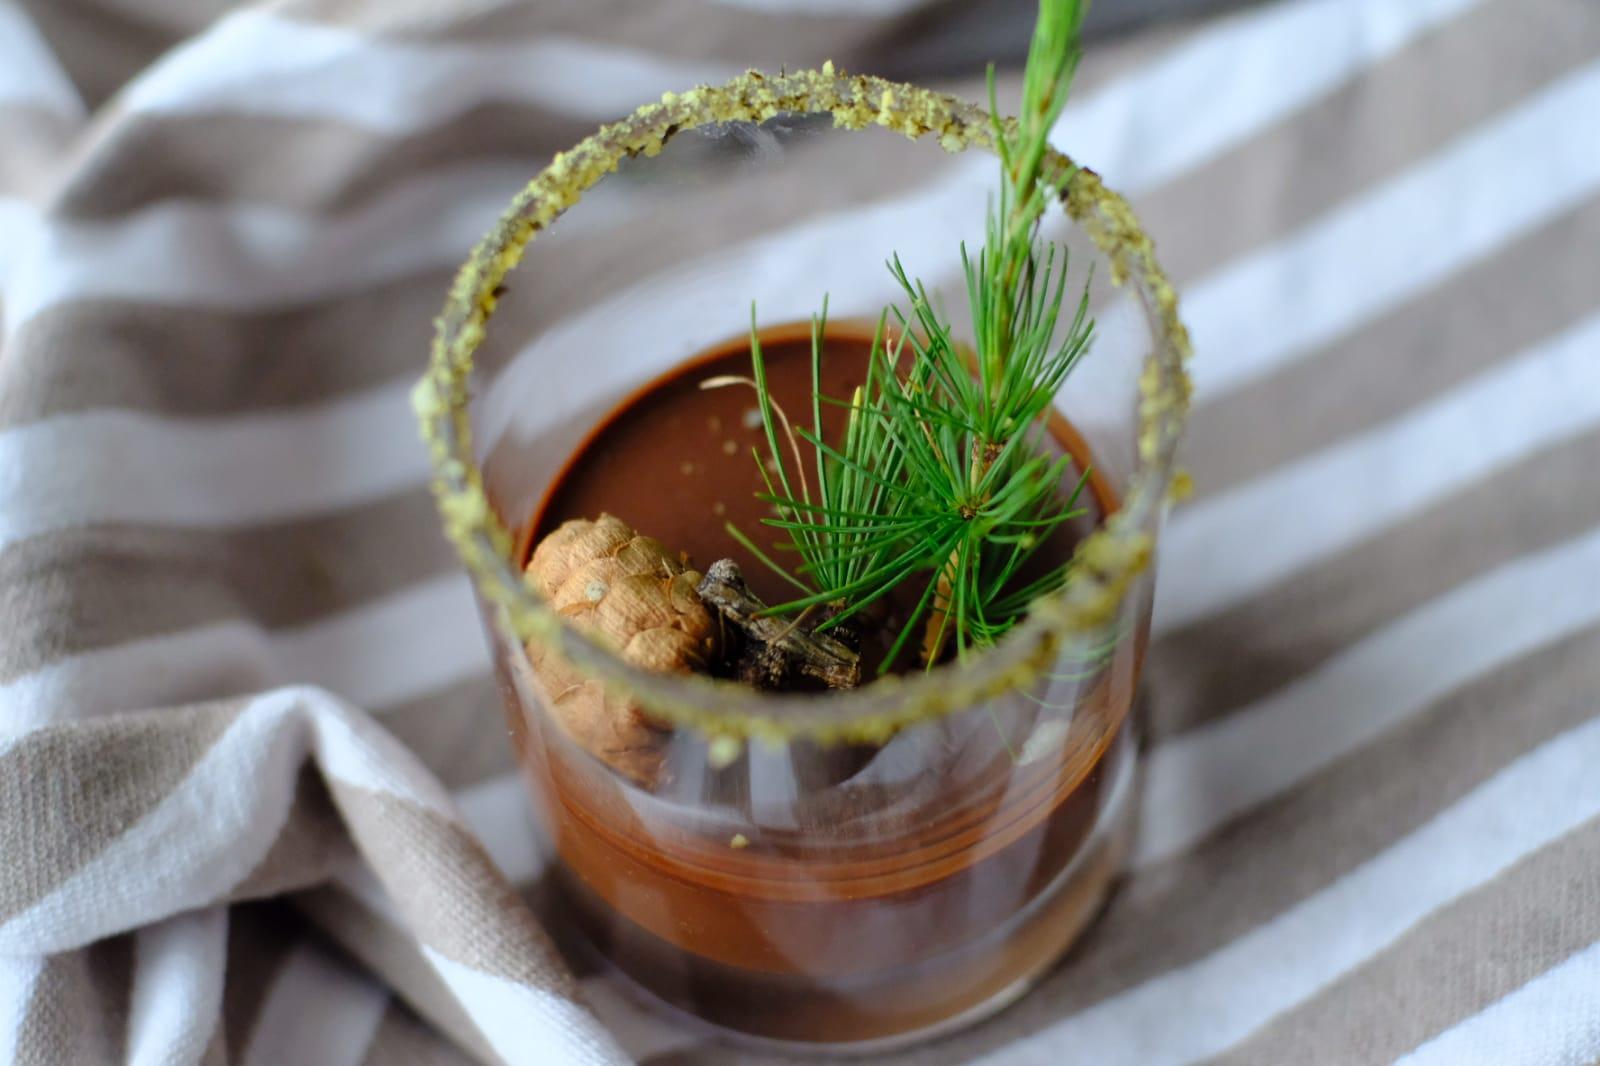 Lemon and Pine Chocolate Mousse